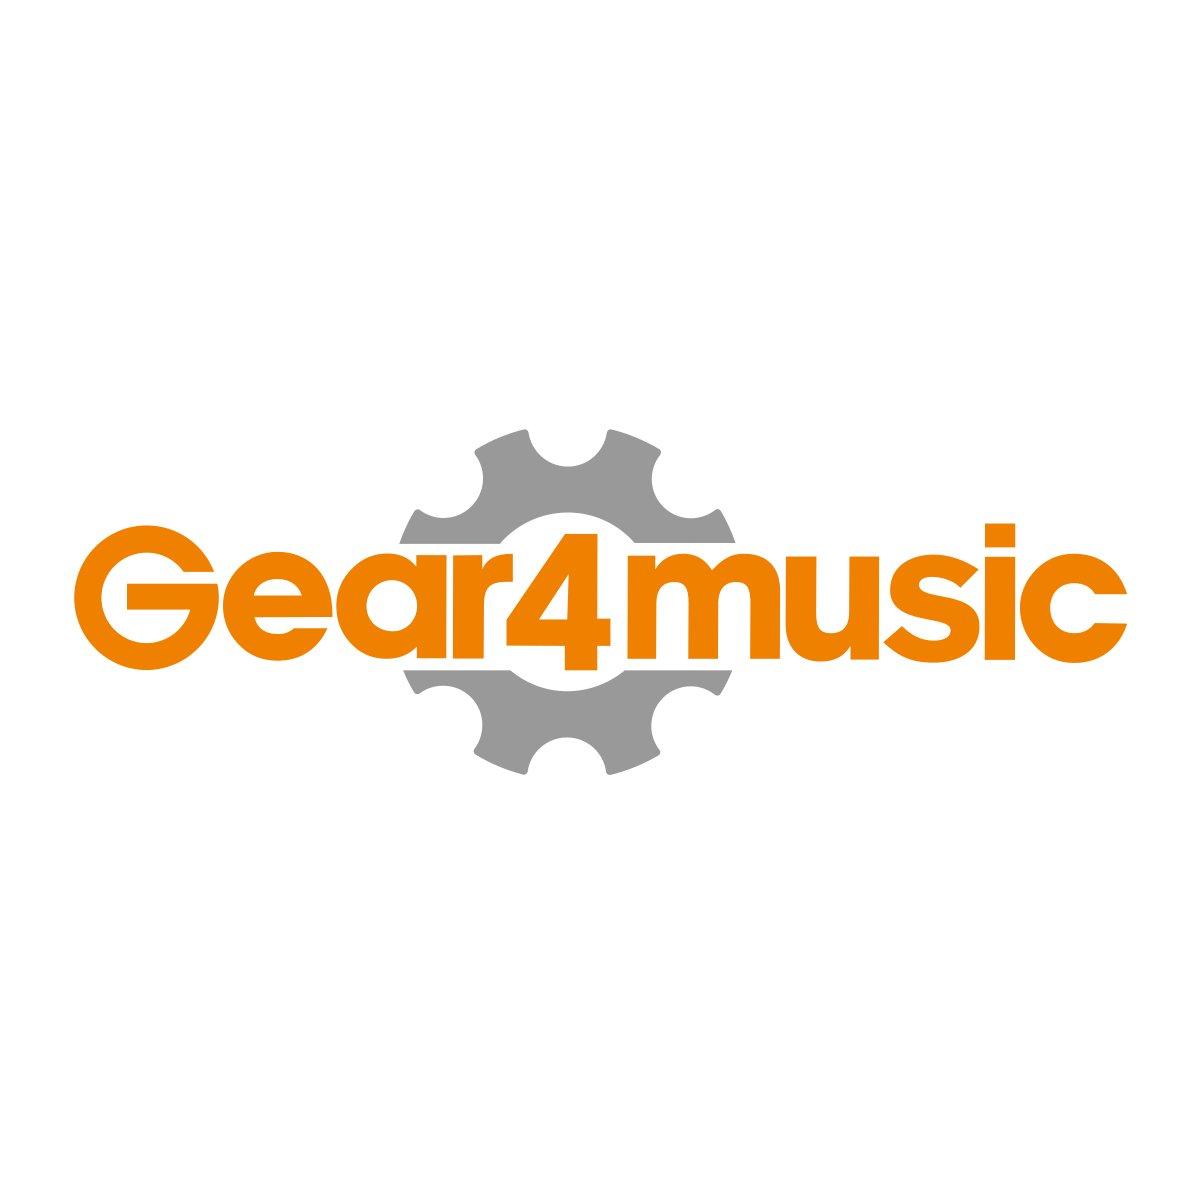 yamaha recording custom aluminum snare drum 14 39 39 x 5 5 39 39 at gear4music. Black Bedroom Furniture Sets. Home Design Ideas